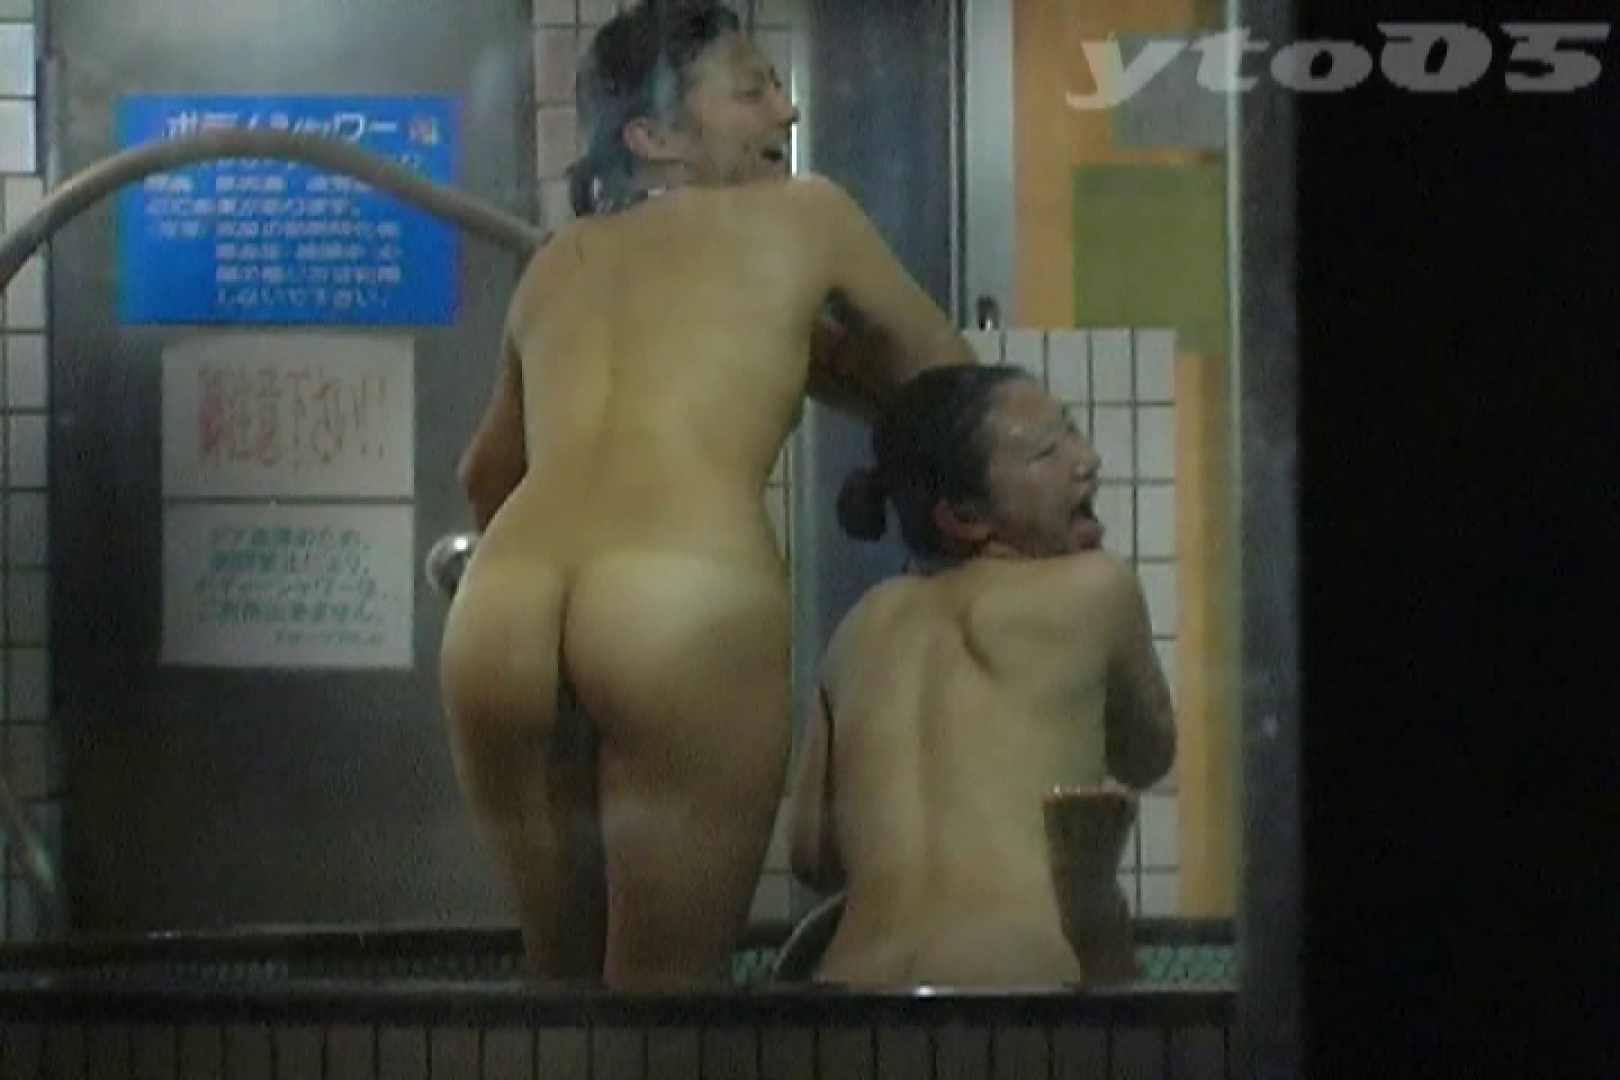 ▲復活限定▲合宿ホテル女風呂盗撮 Vol.31 合宿 濡れ場動画紹介 85pic 41